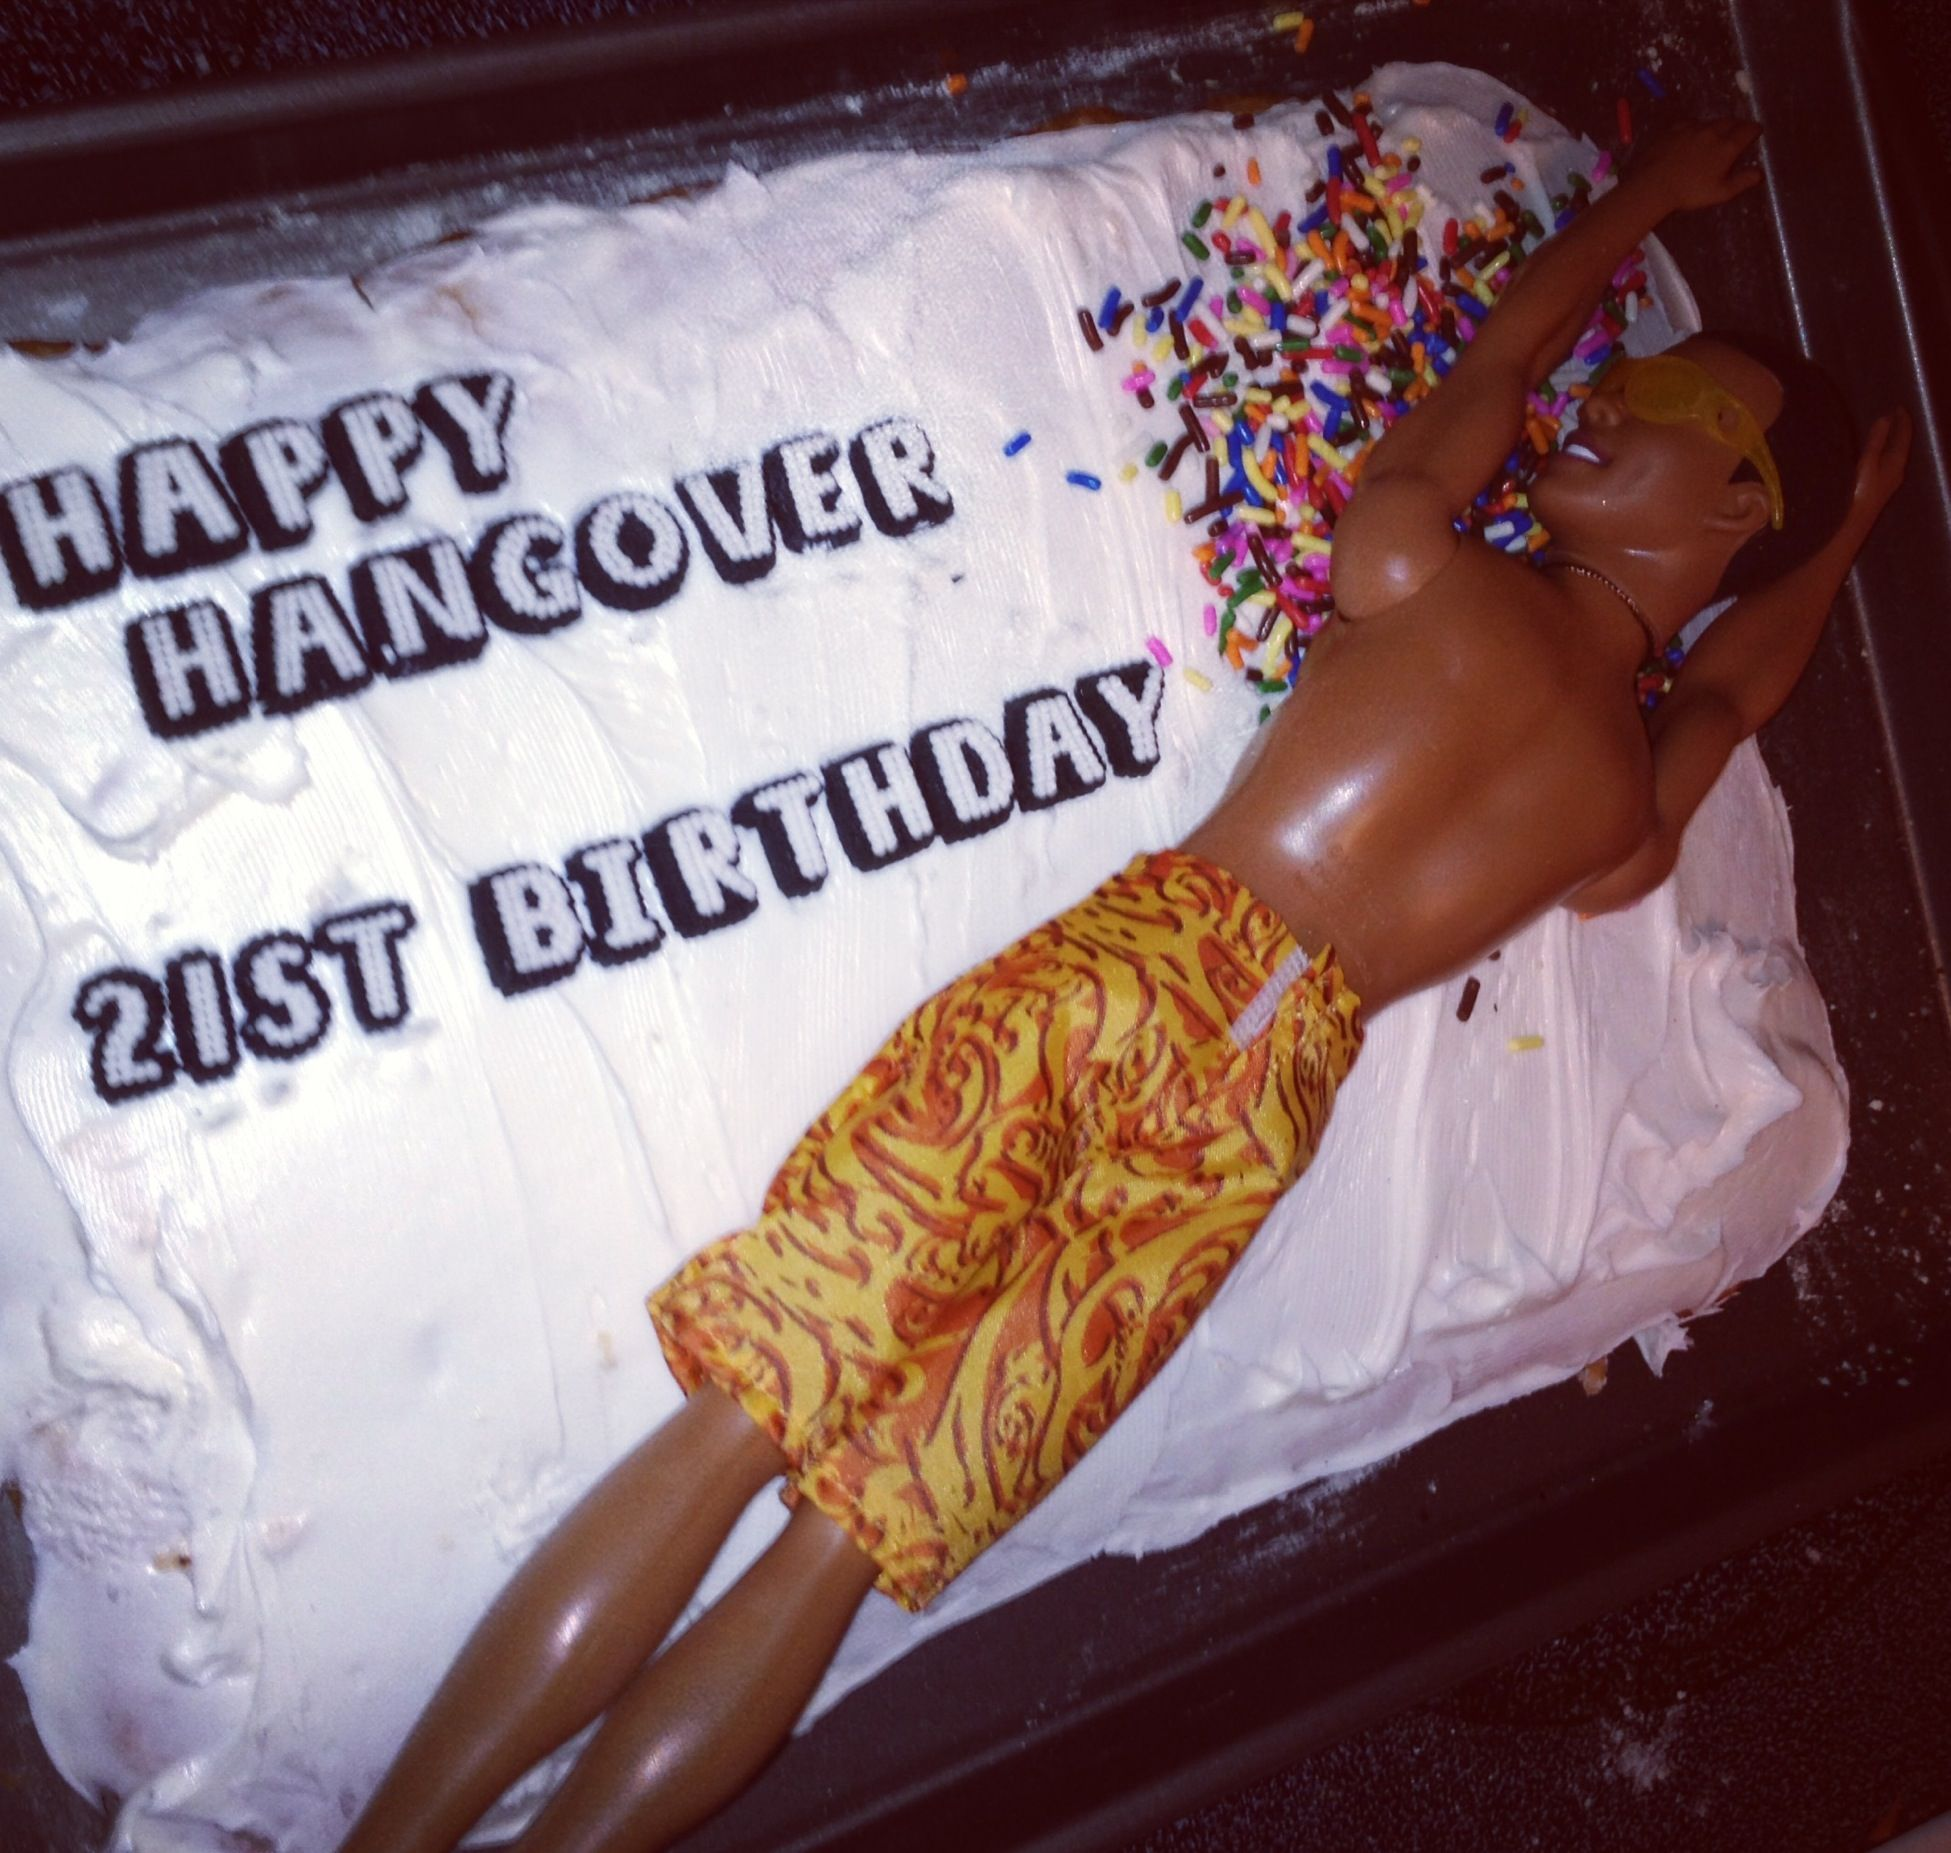 Birthday cake I made for my boyfriends 21st Laying in vomit using